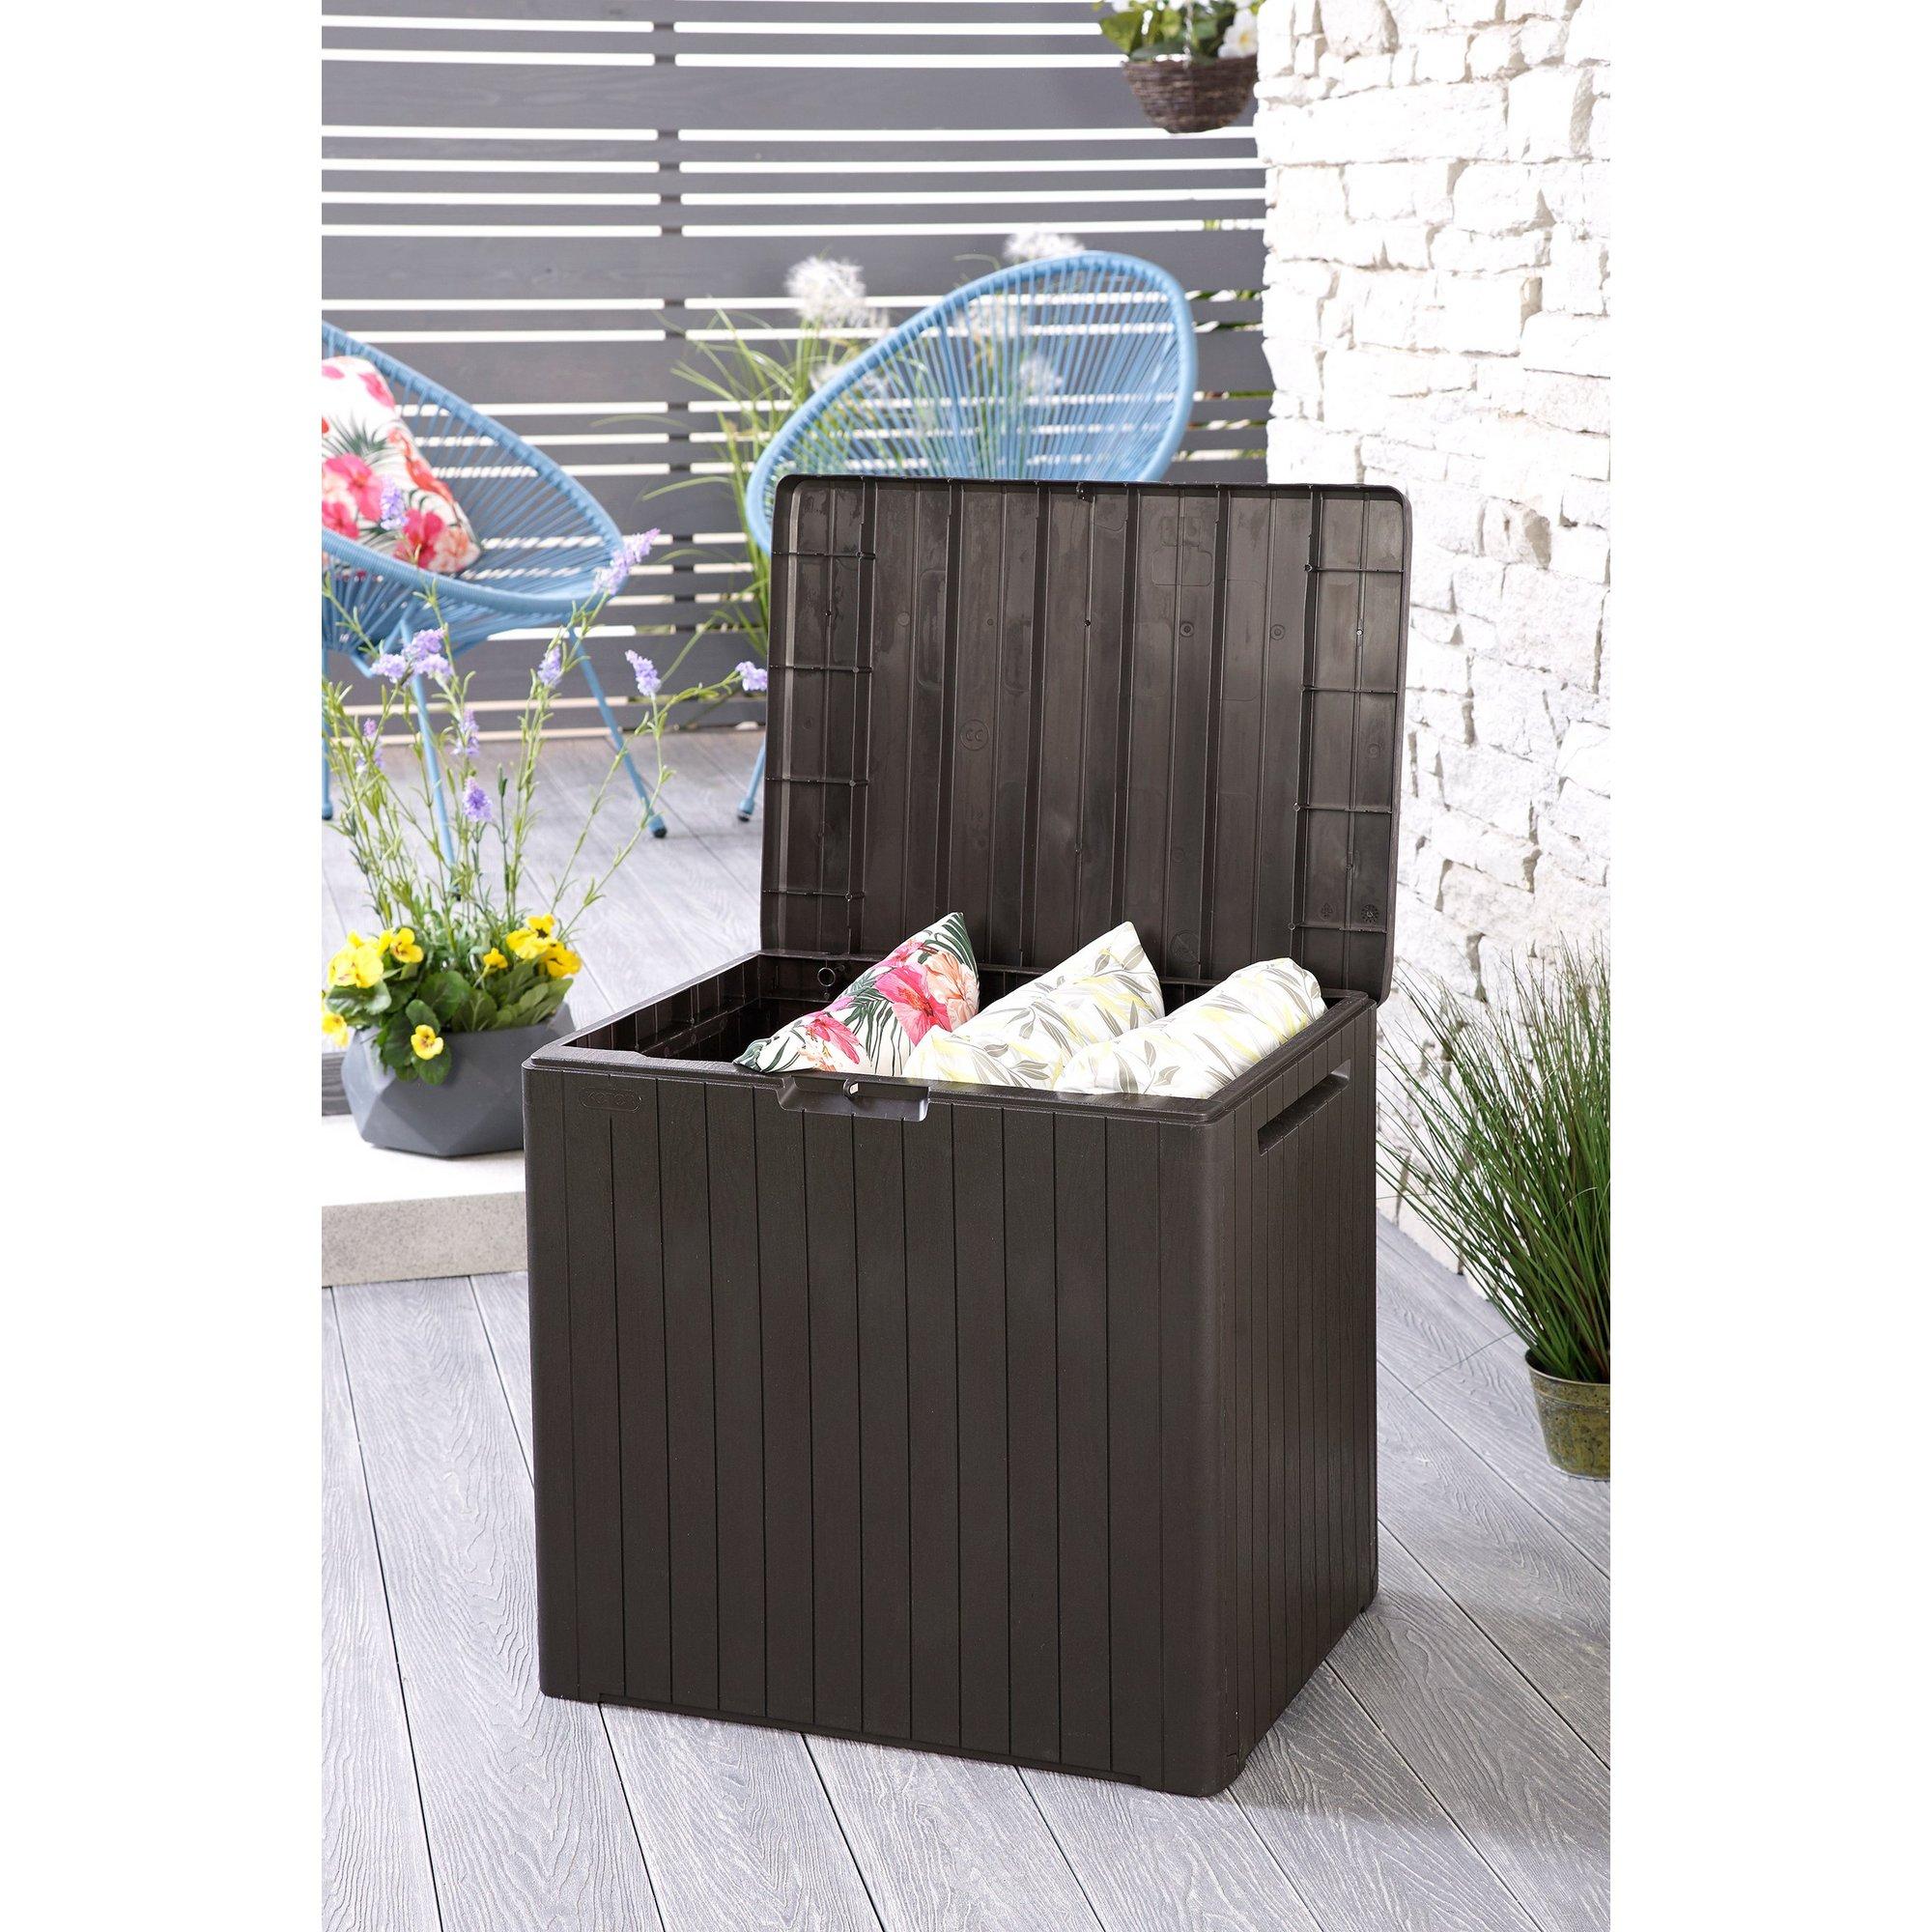 Image of Keter City Storage Box